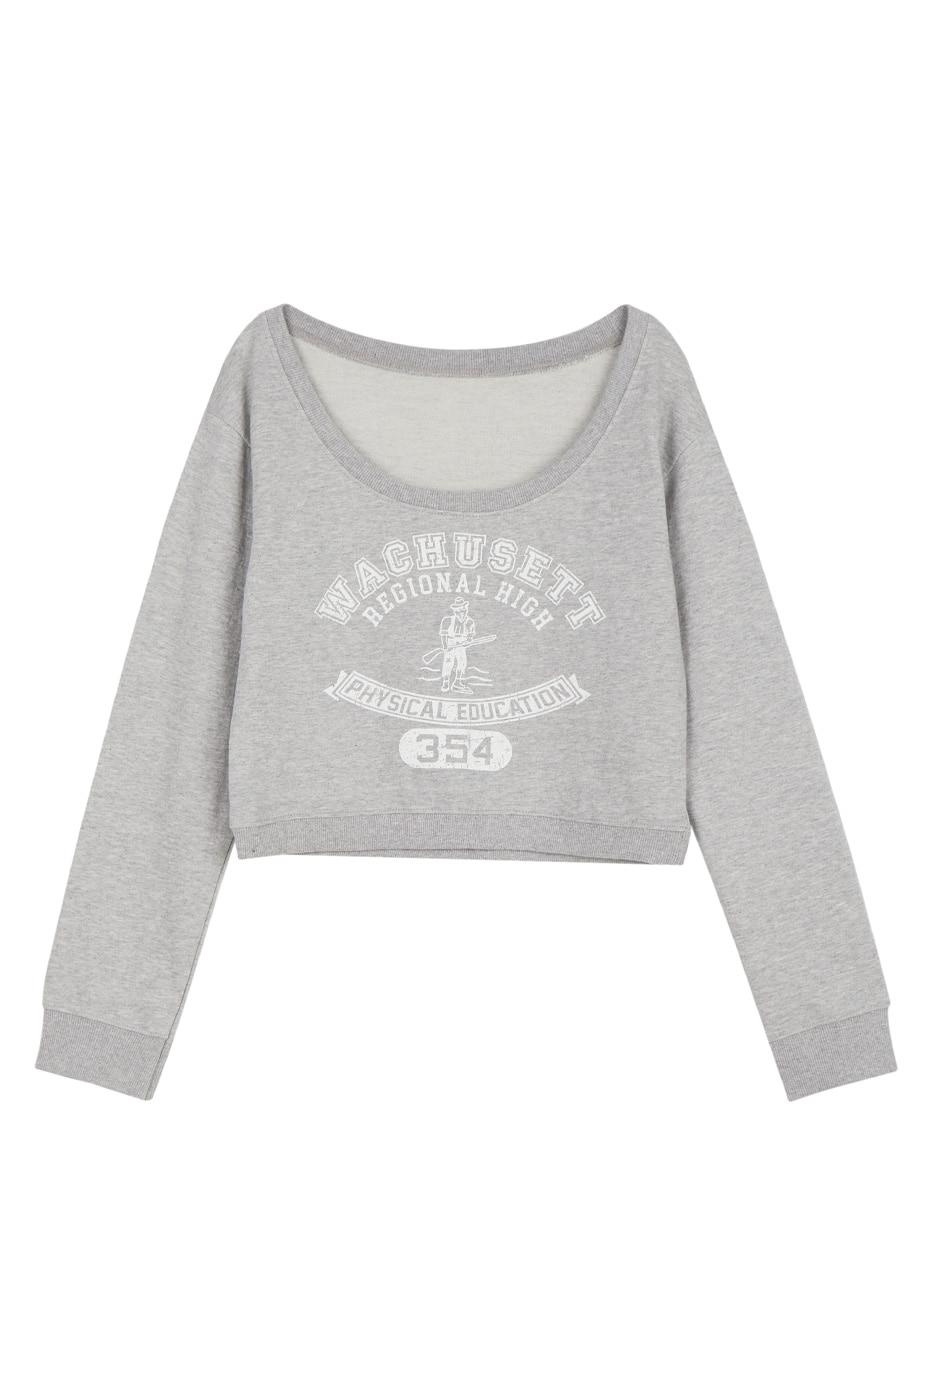 Brooklyn printed sweatshirt